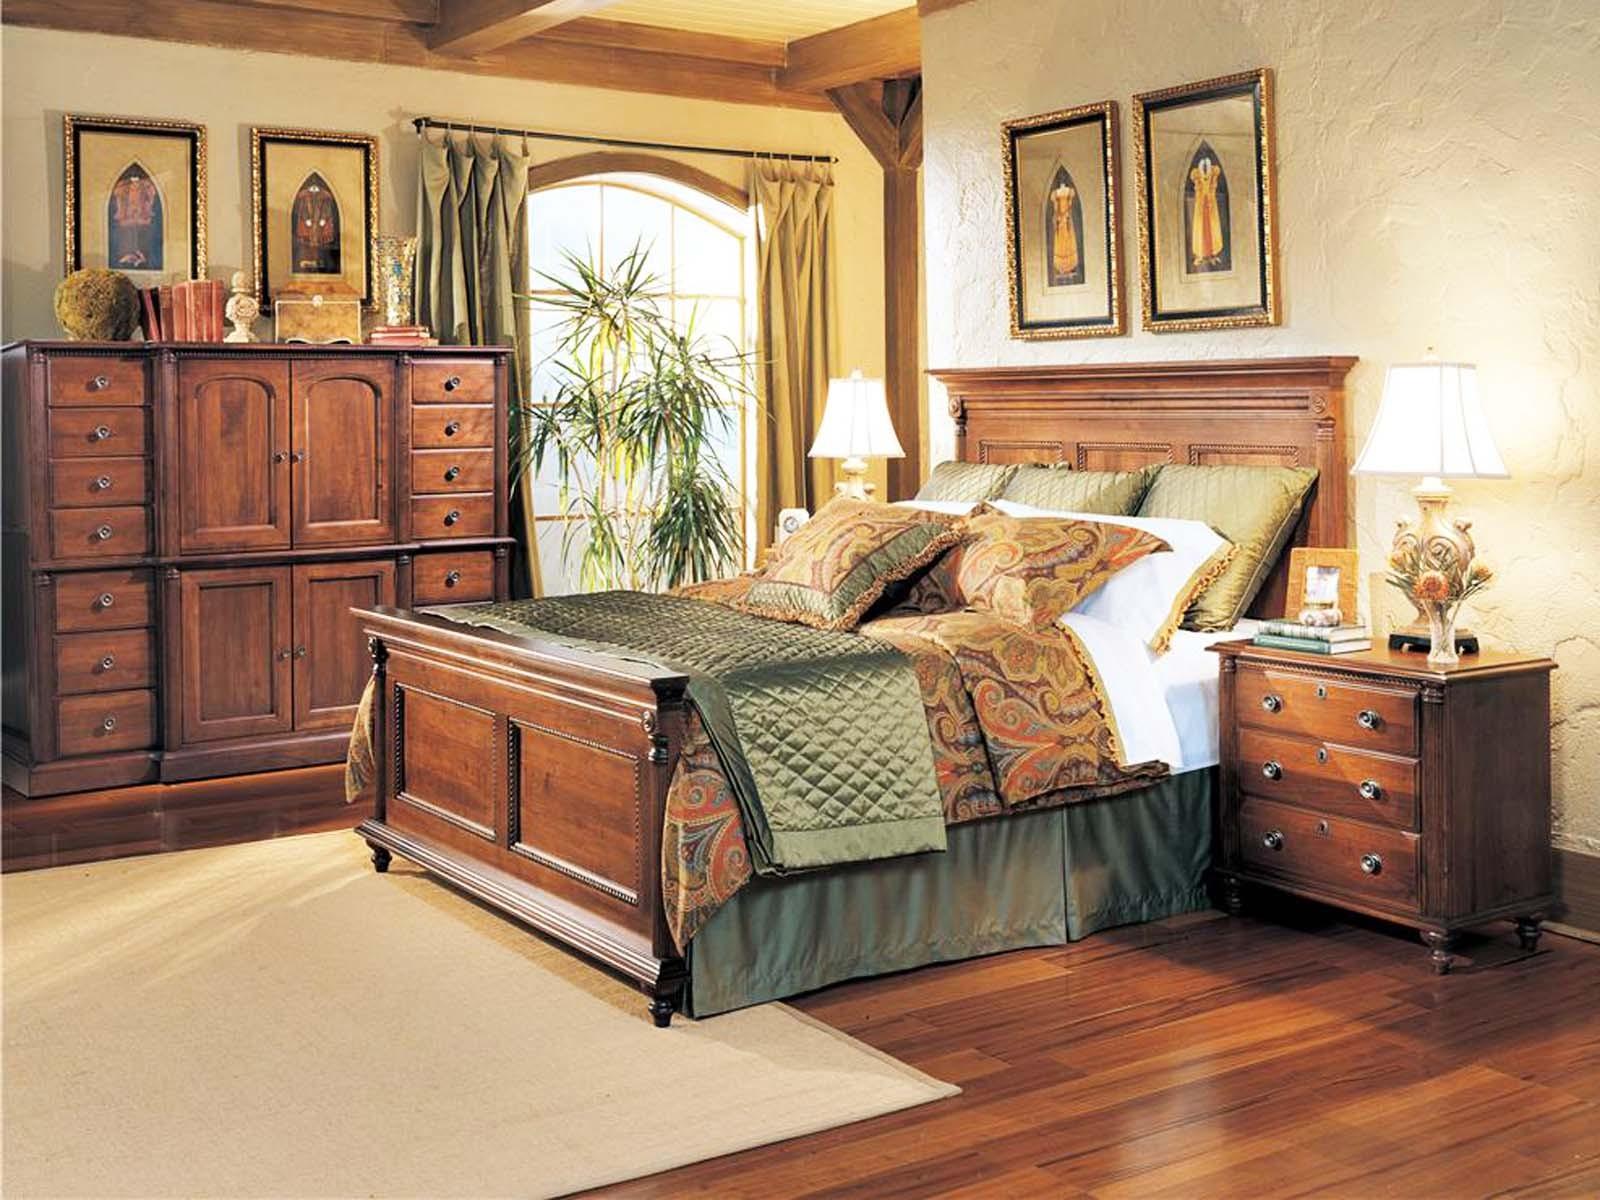 Durham Furniture Savile Row Panel Bedroom Set in Victorian Mahogany